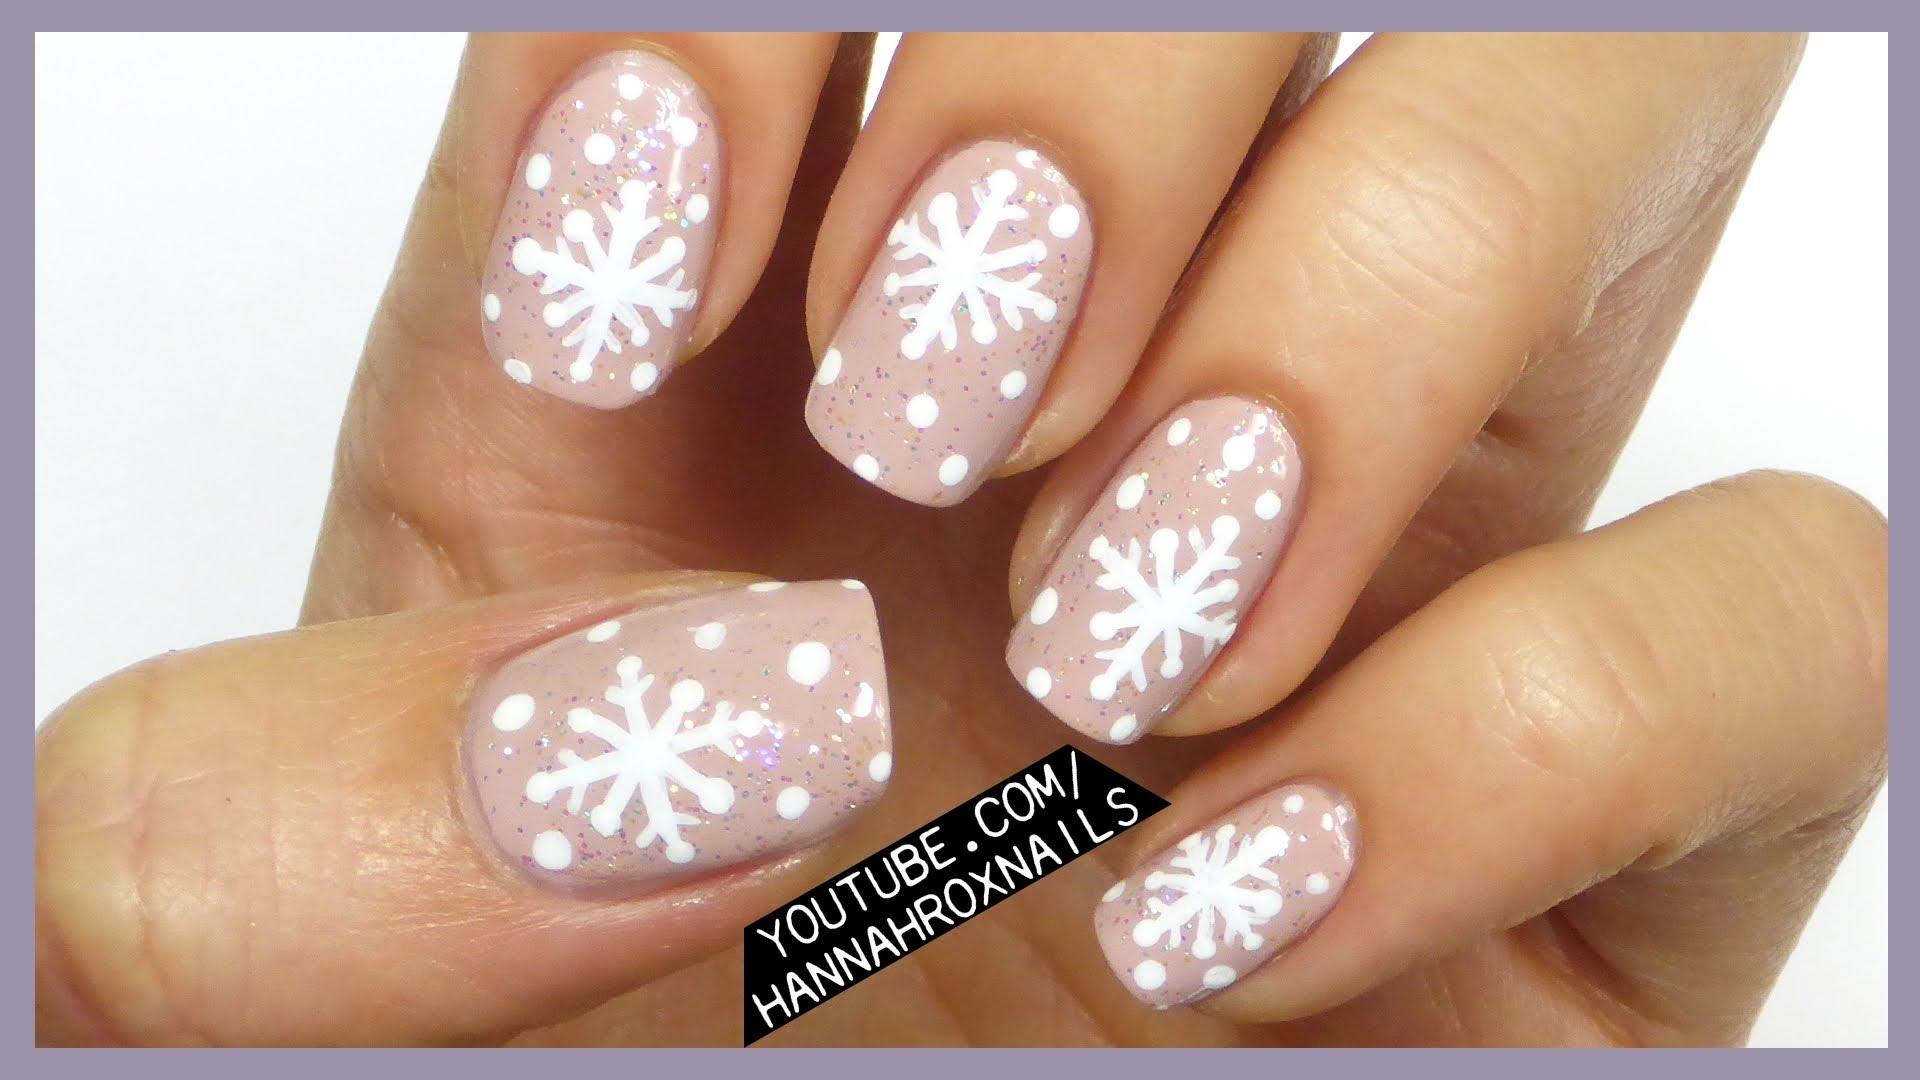 50 latest winter nail art design ideas white snowflakes design winter nail art prinsesfo Images